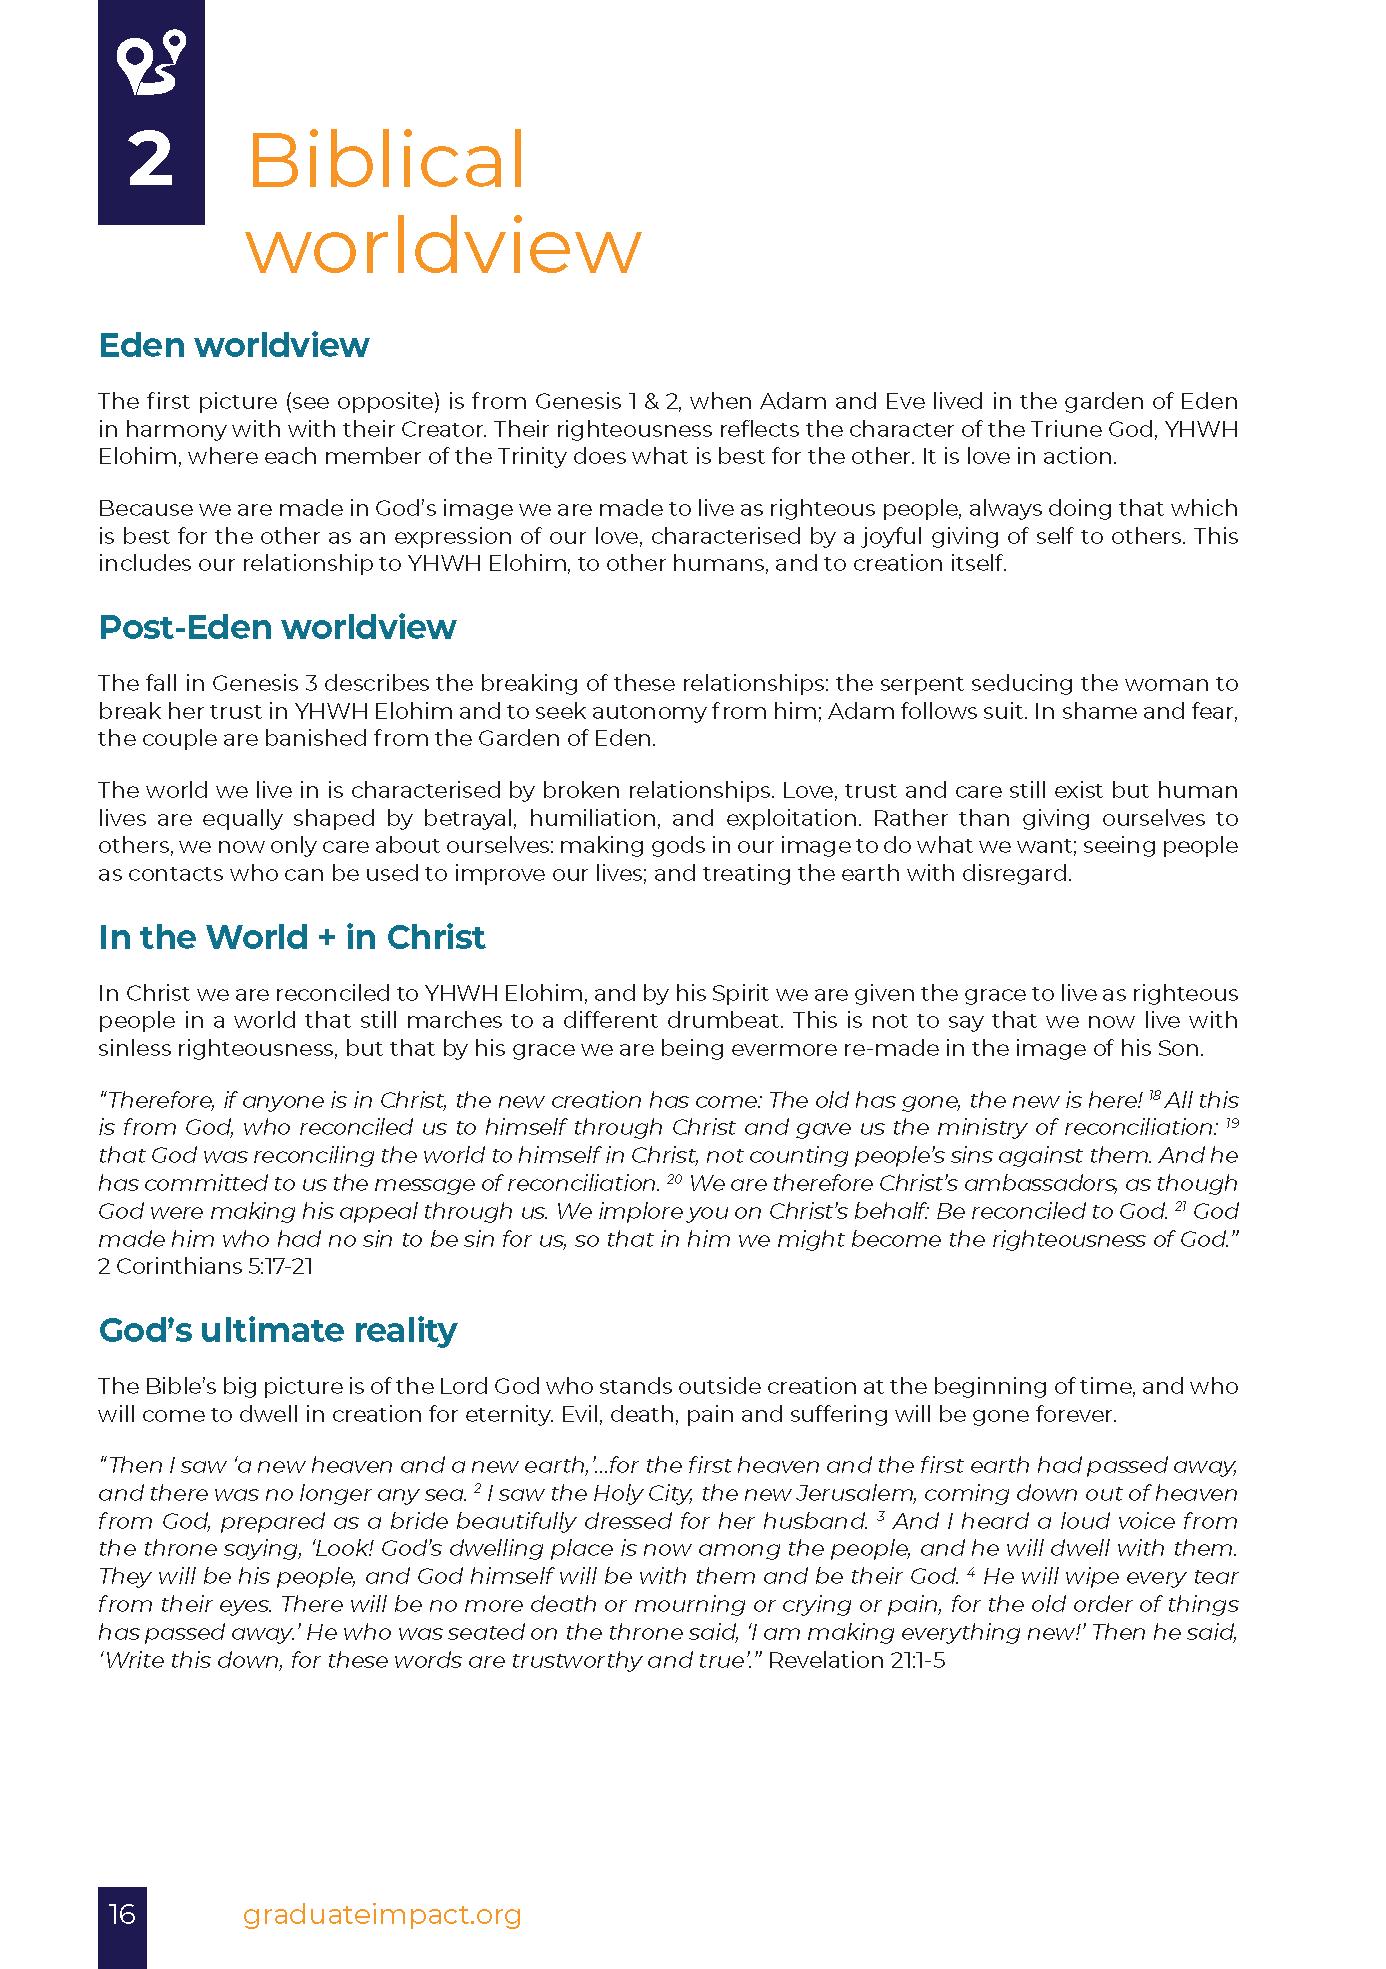 Graduate-Impact-Workbook-B5-Module-1-3 18.png